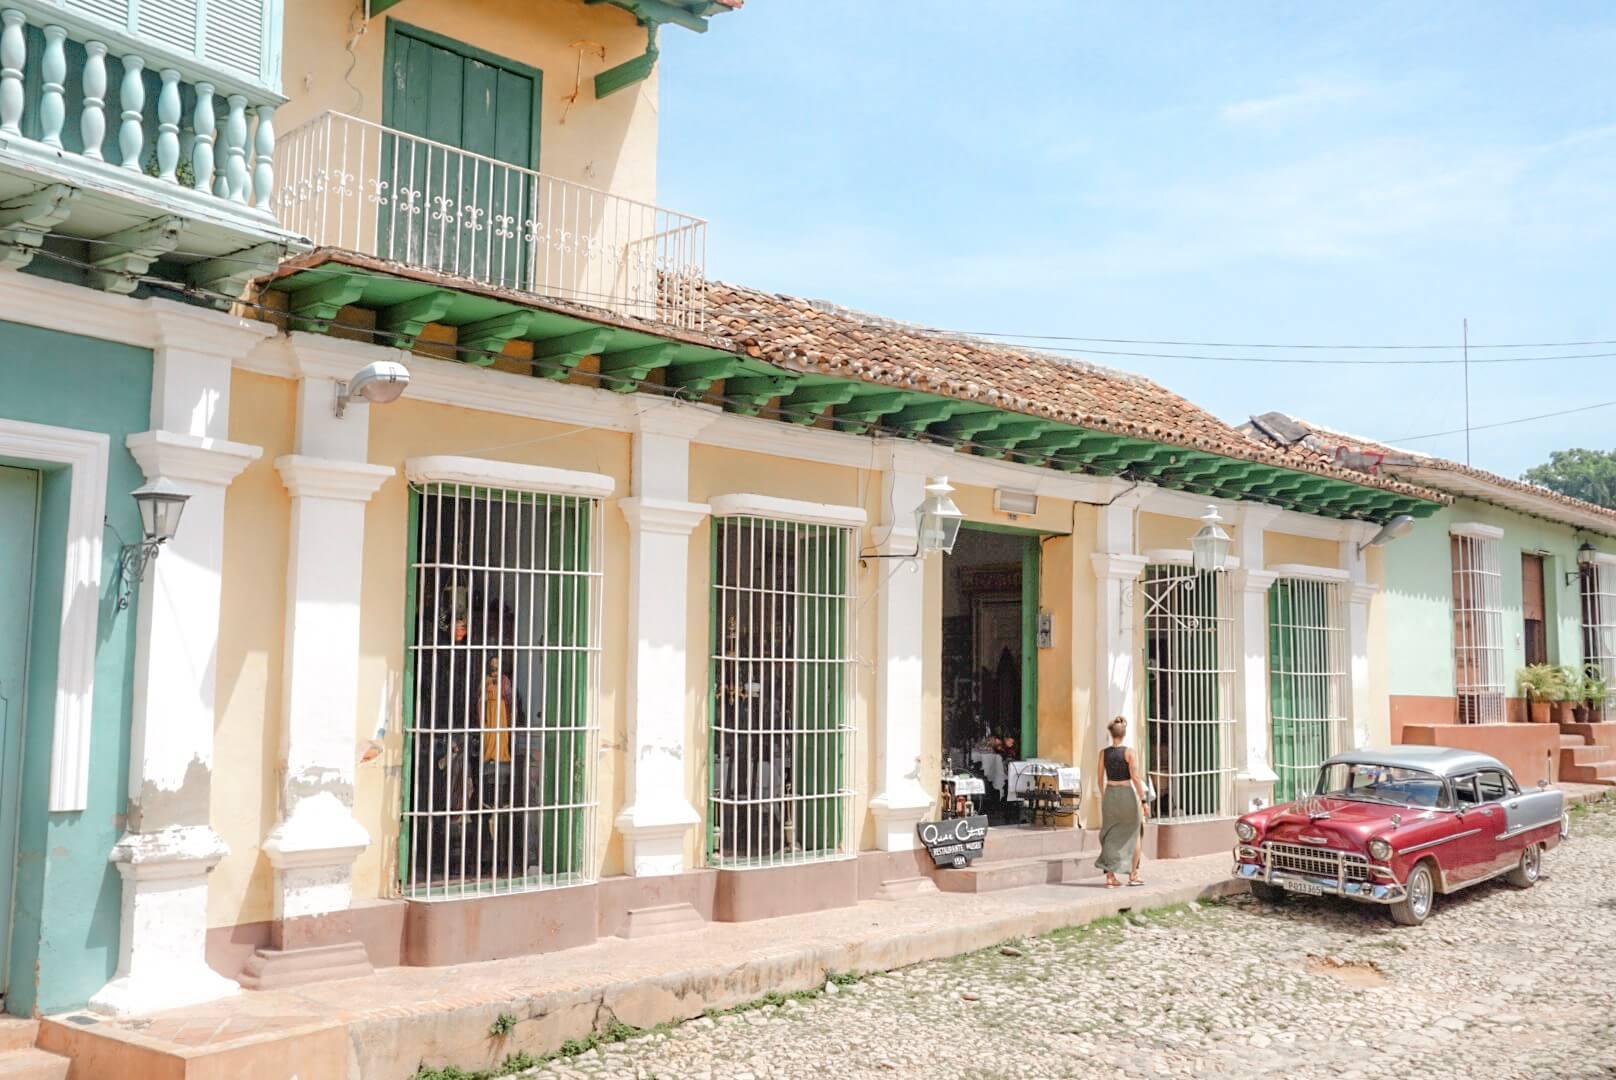 voitures americaine village cubain trinidad